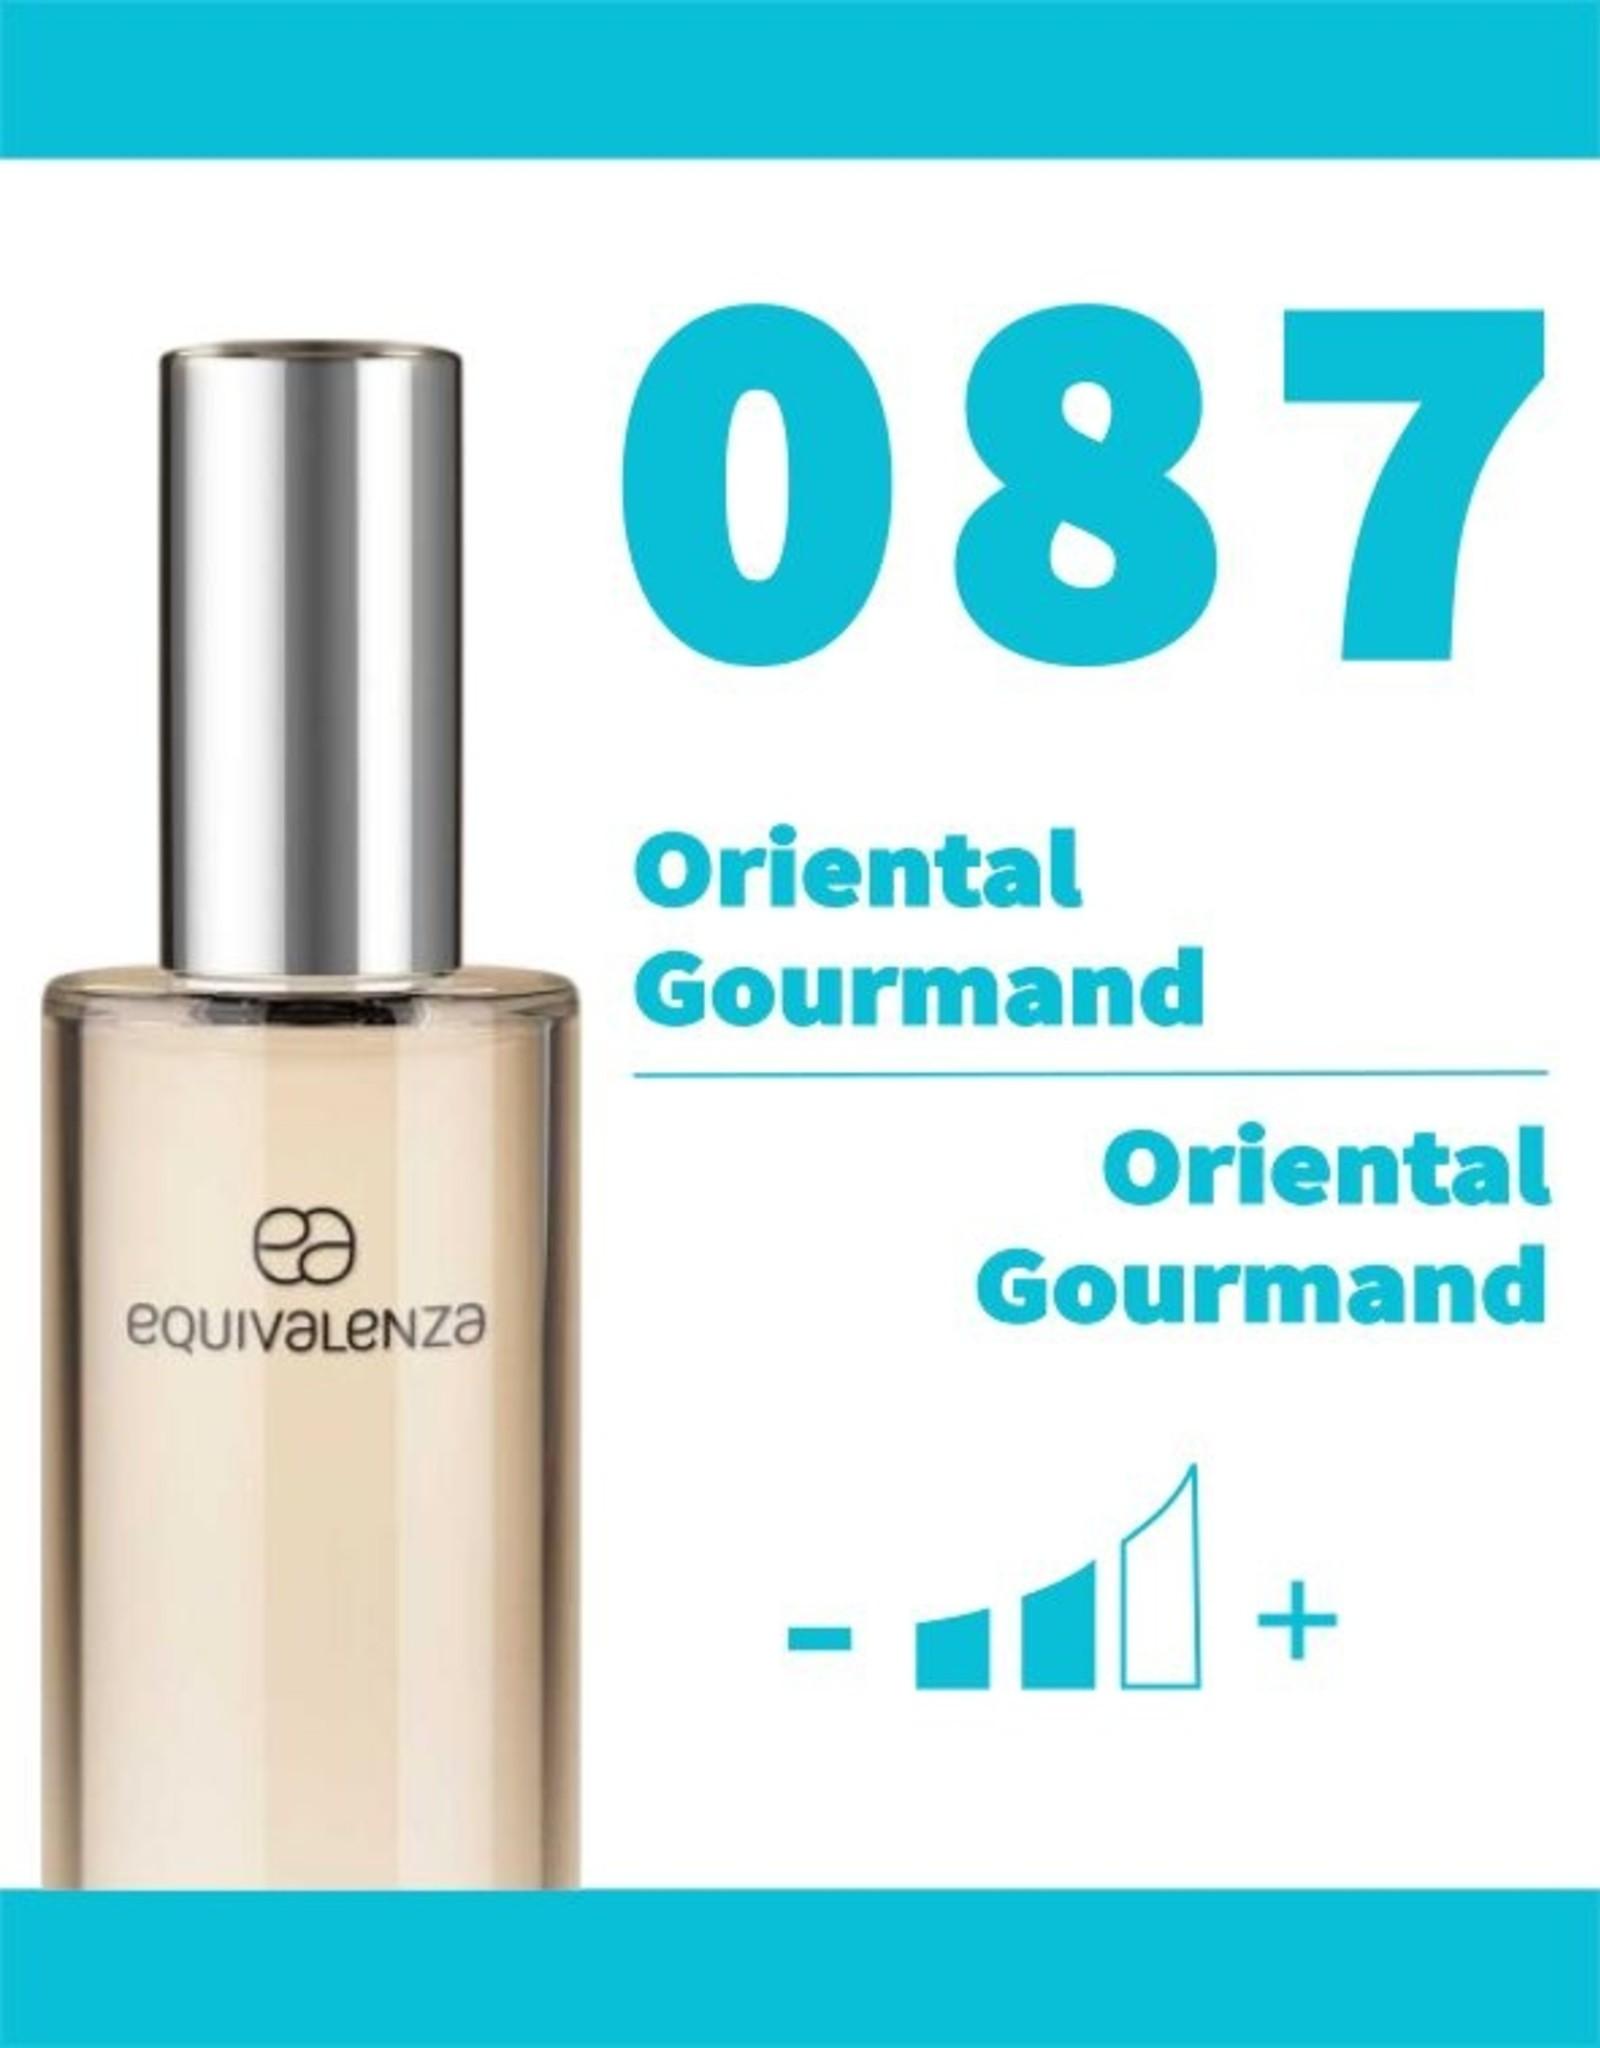 Equivalenza Eau de Parfum Oriental Gourmand 087